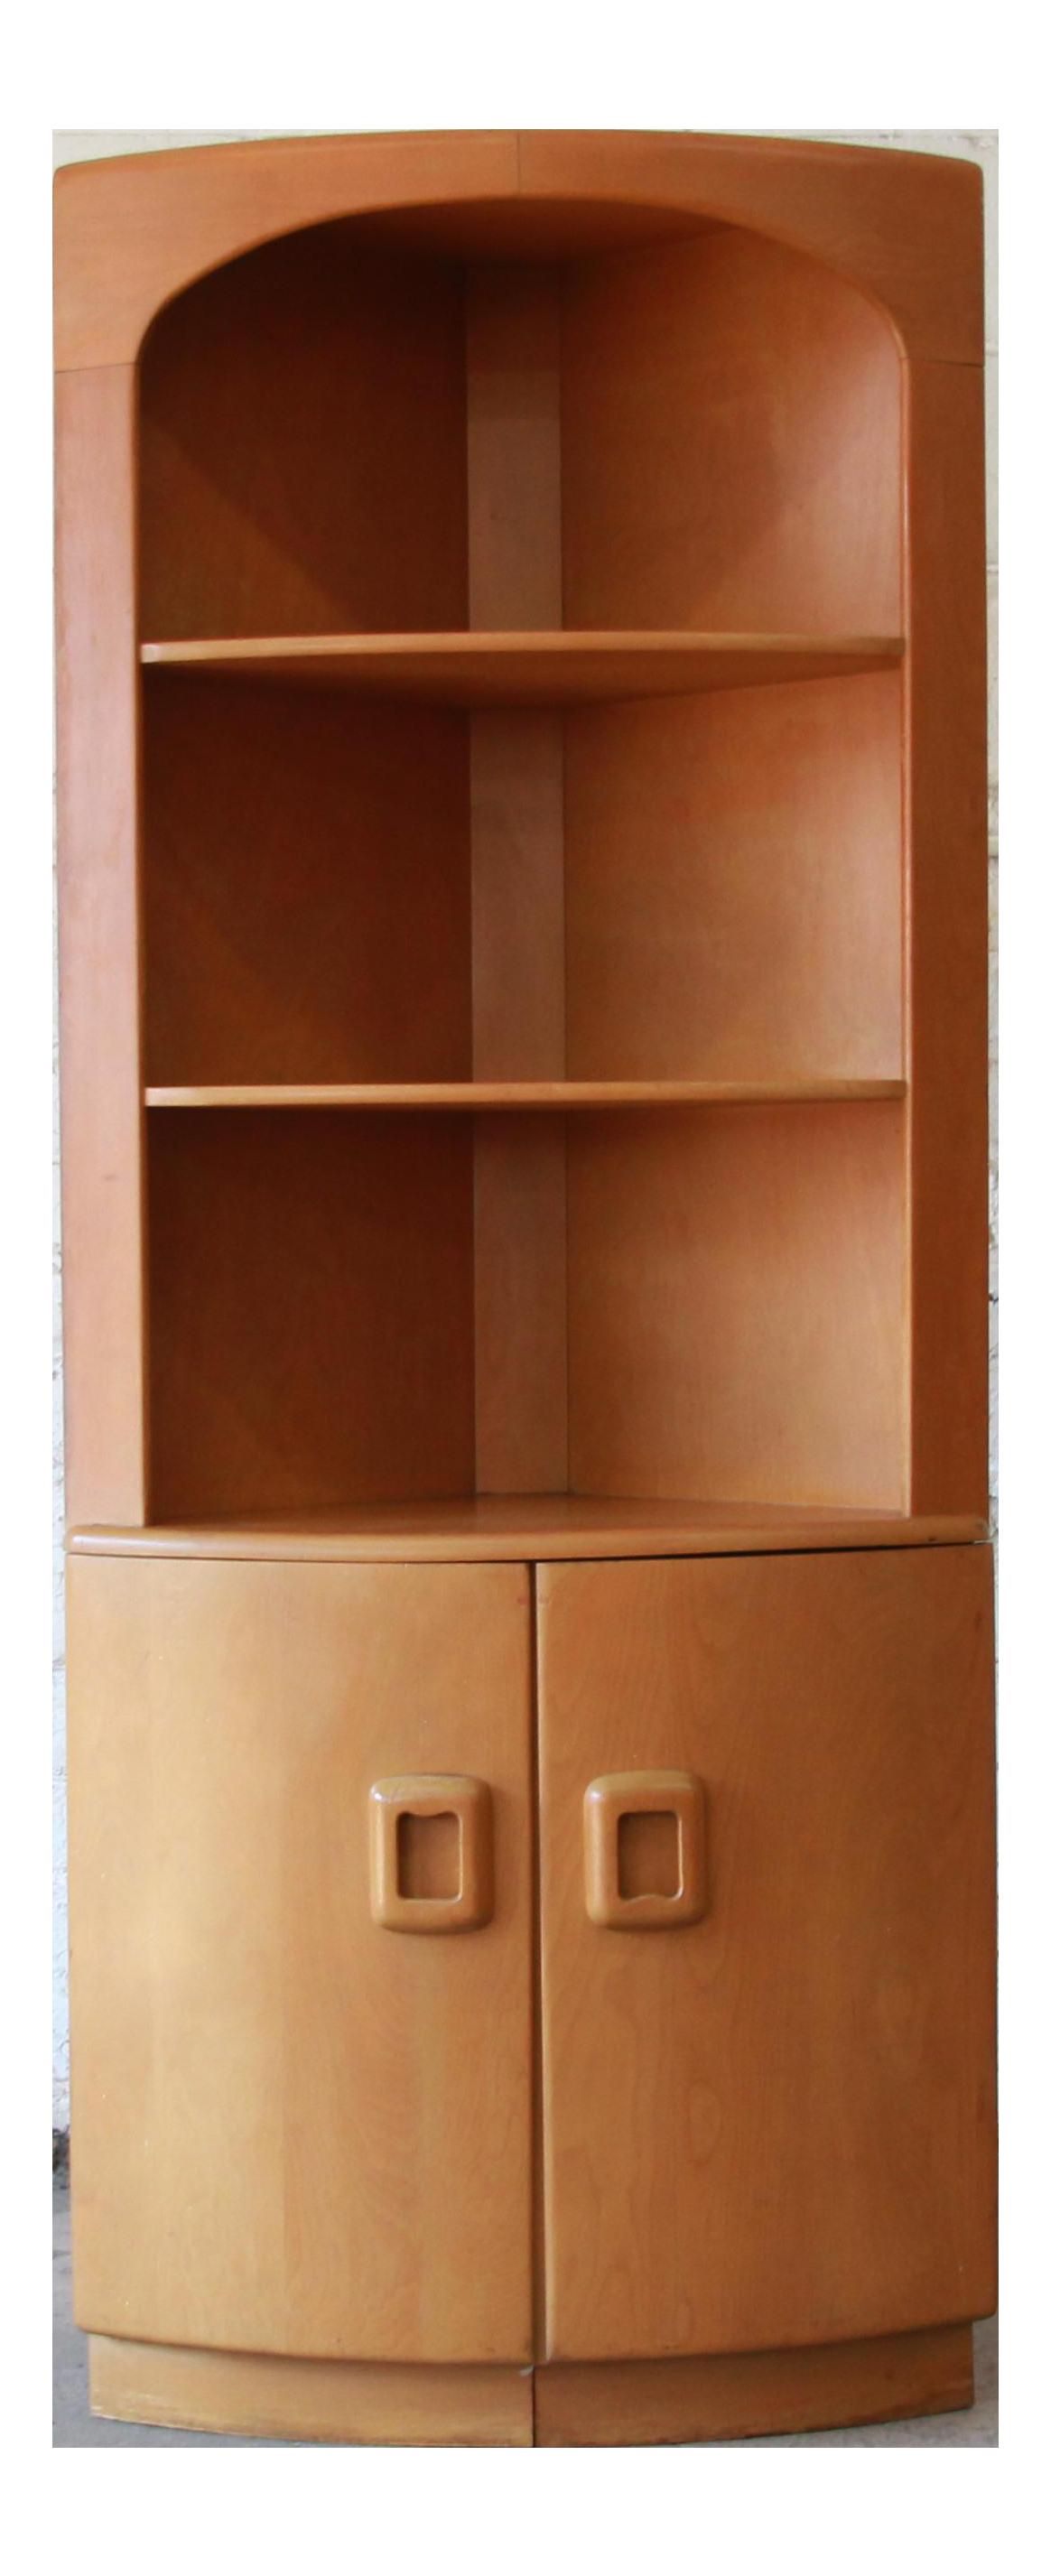 Heywood Wakefield Mid Century Modern Corner Cabinet In Wheat